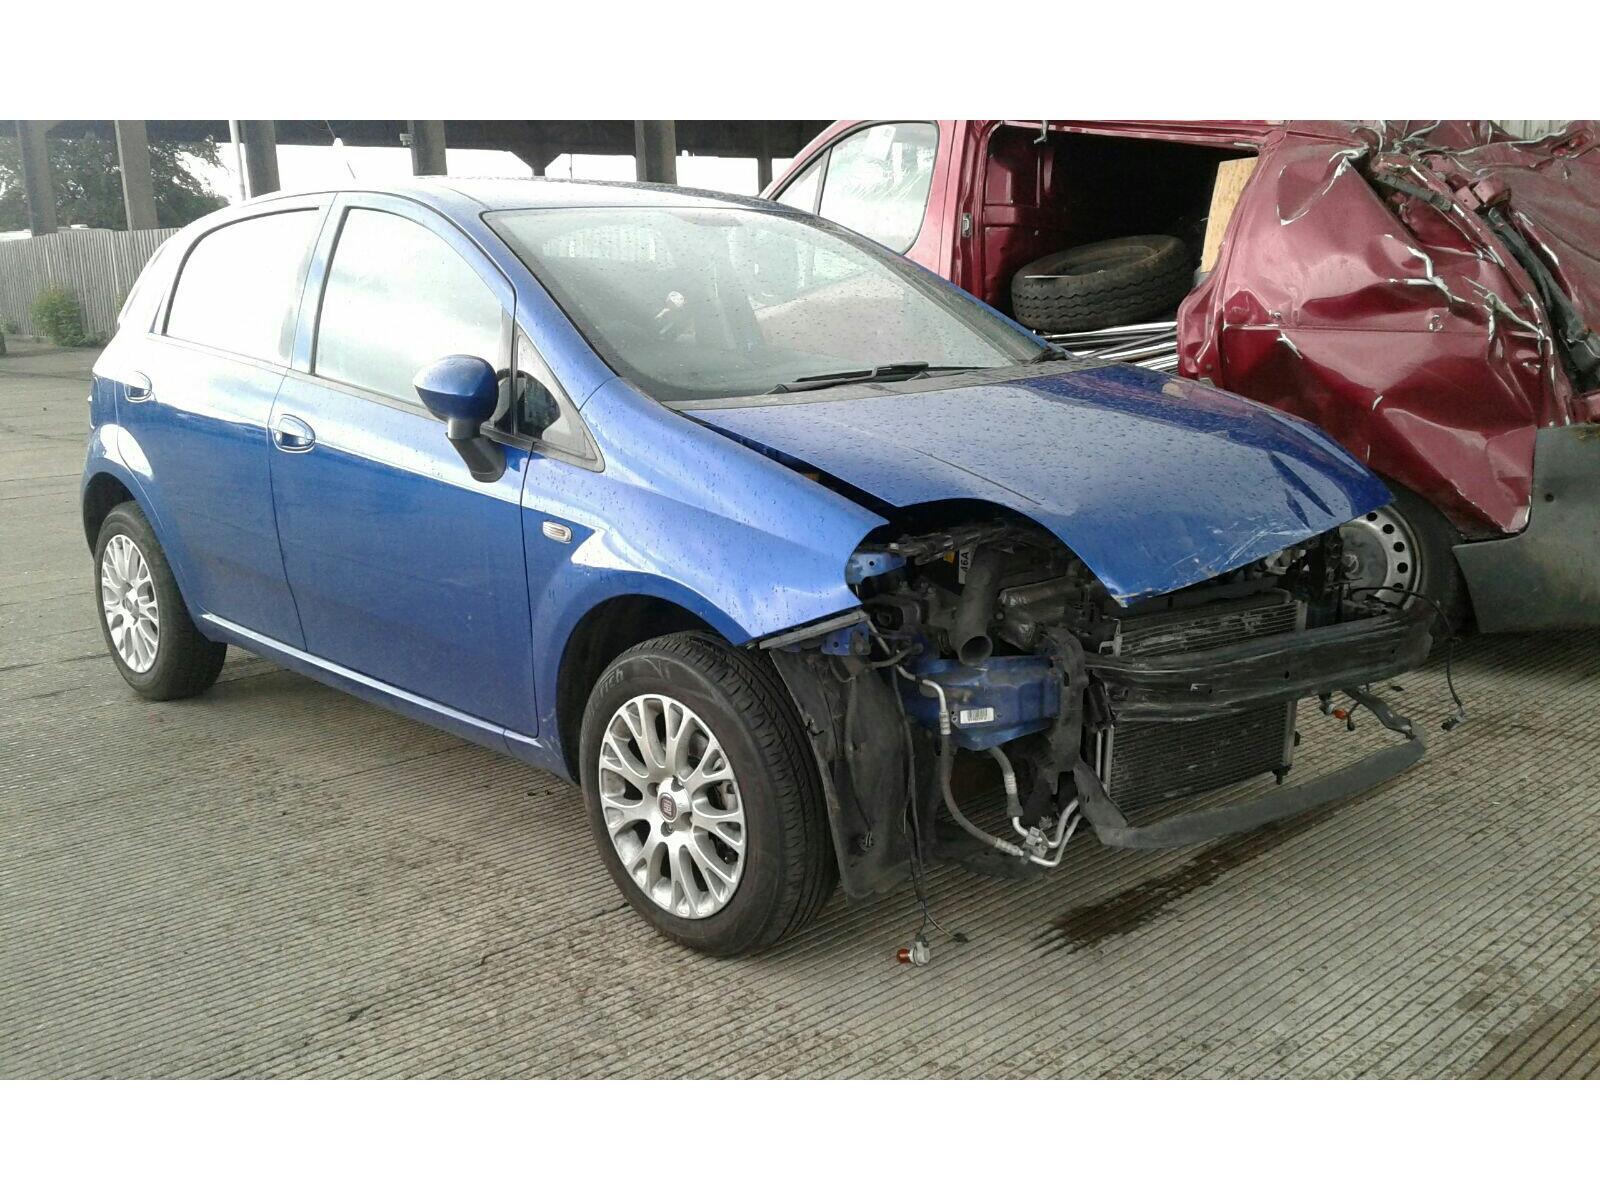 2011 fiat punto evo 2010 to 2012 5 door hatchback petrol manual rh motorhog co uk